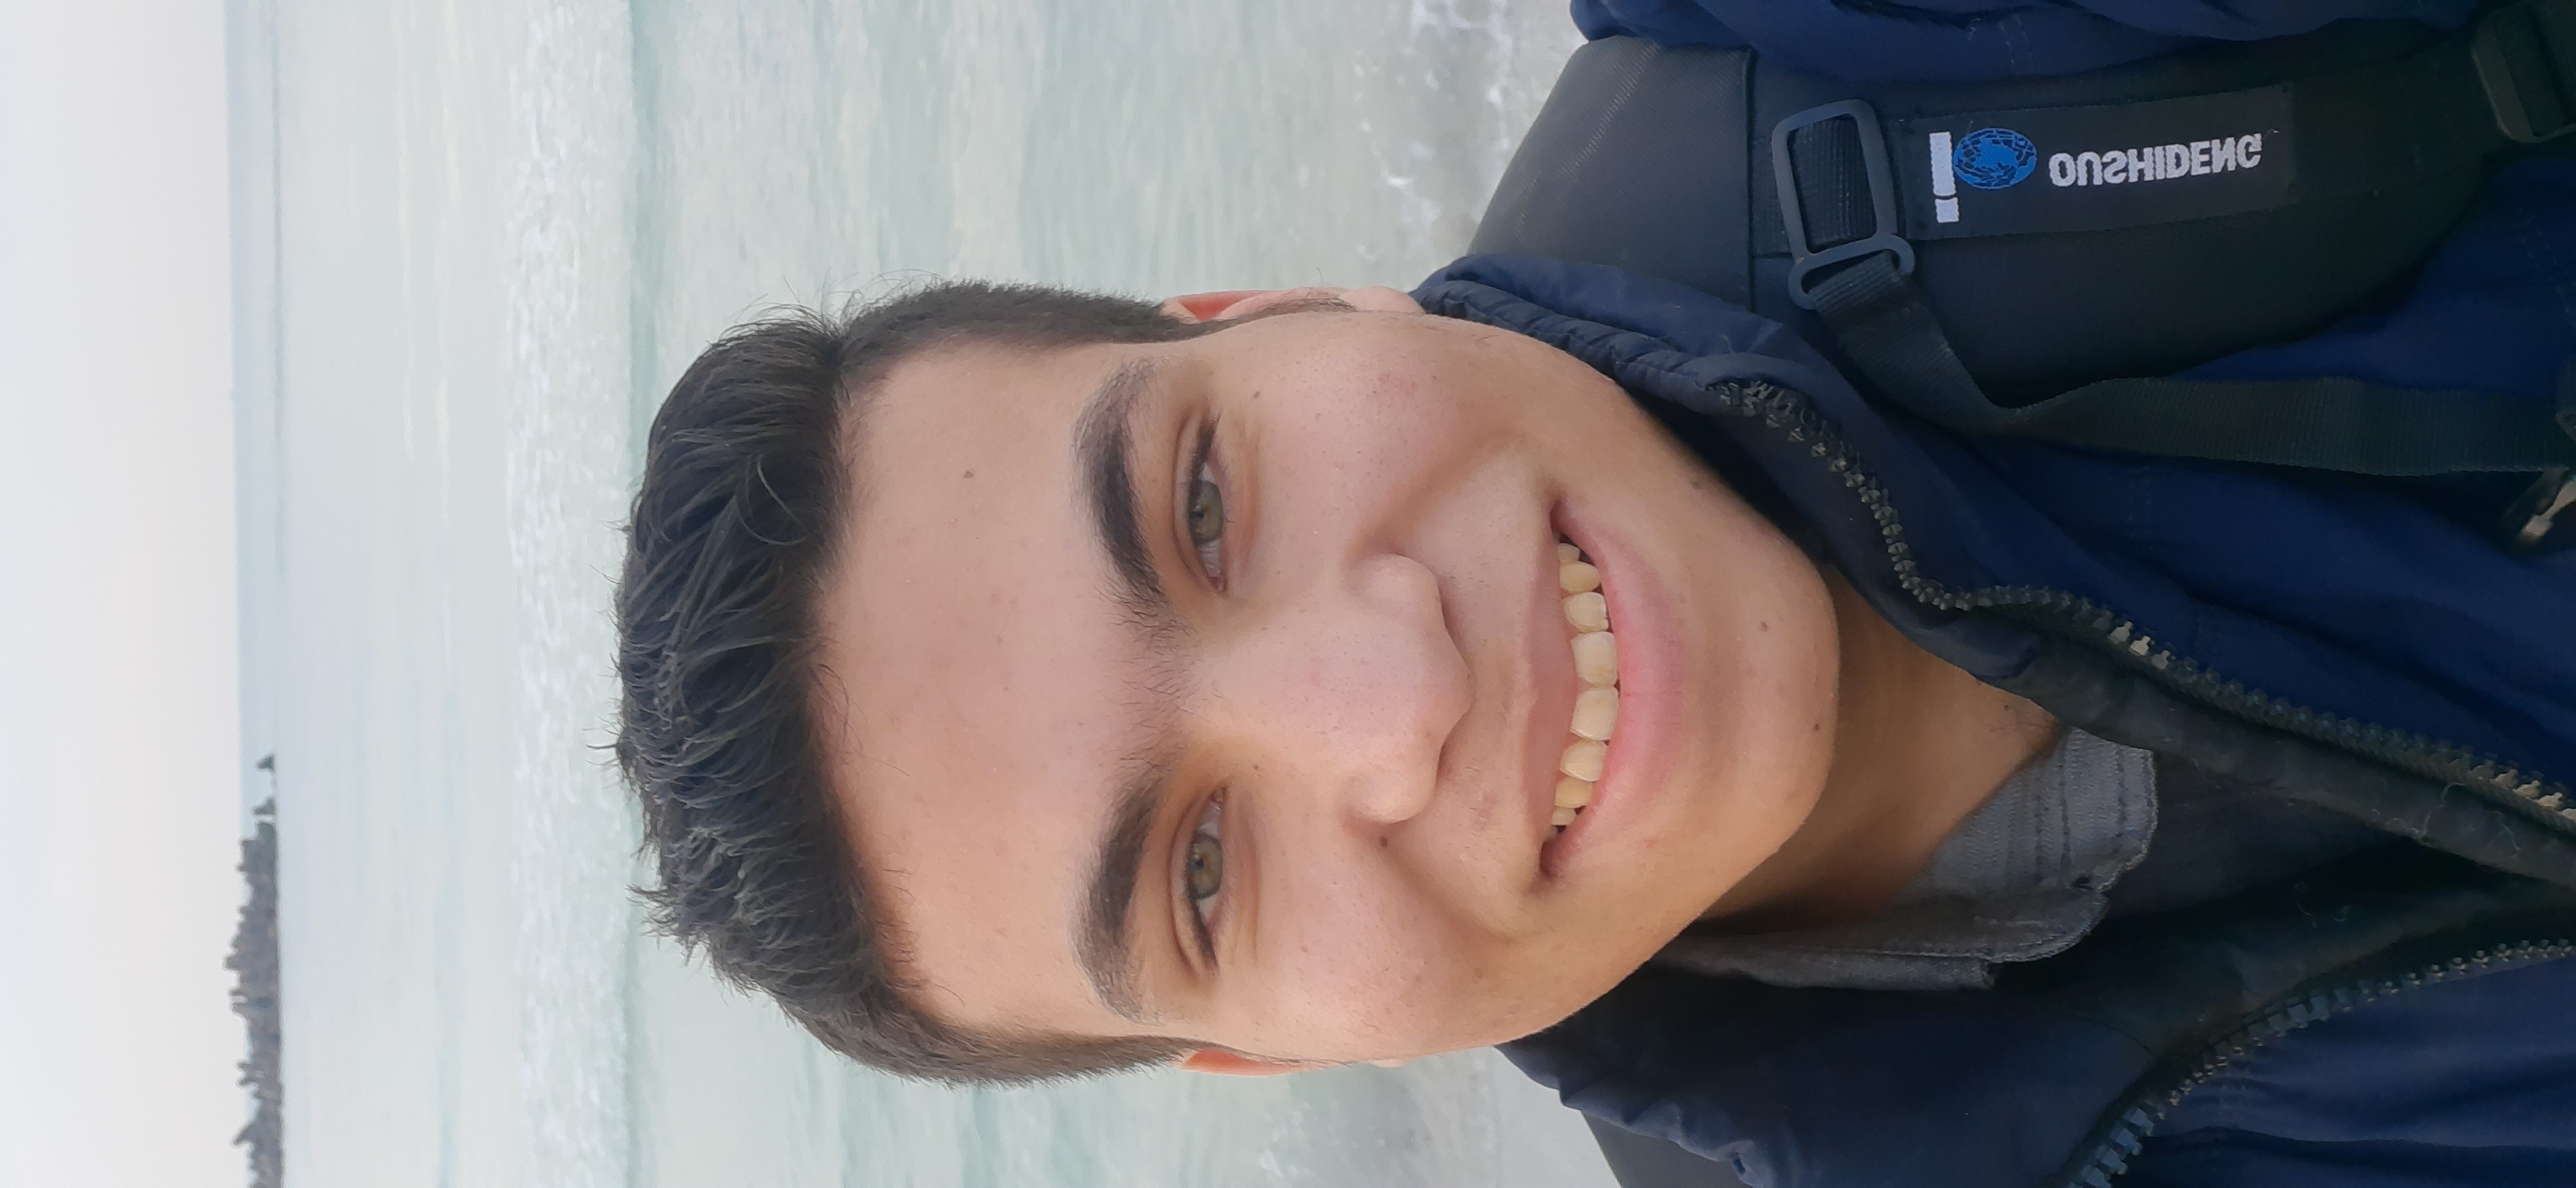 mostafayehea8 Profile Picture